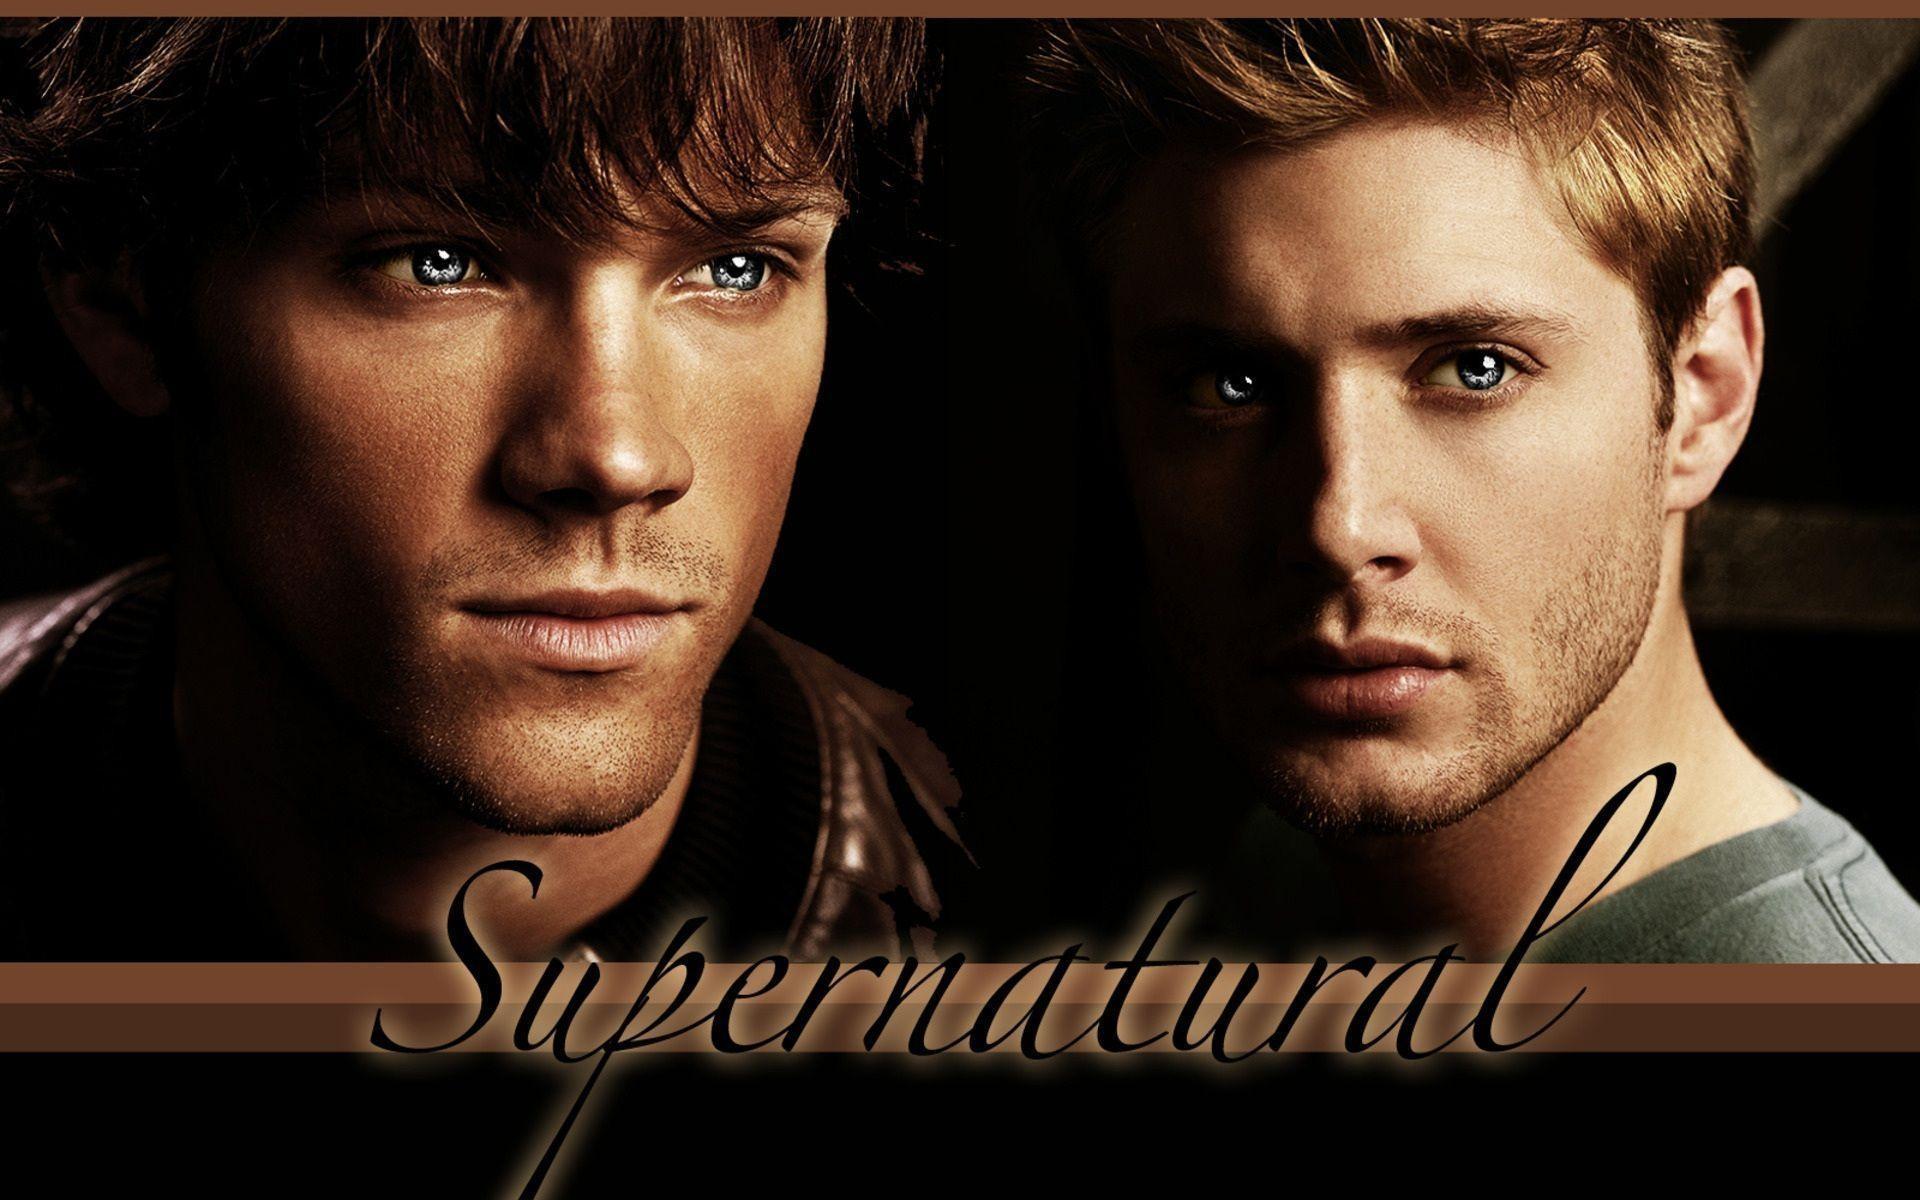 Supernatural characters images Supernatural wallpapers HD .